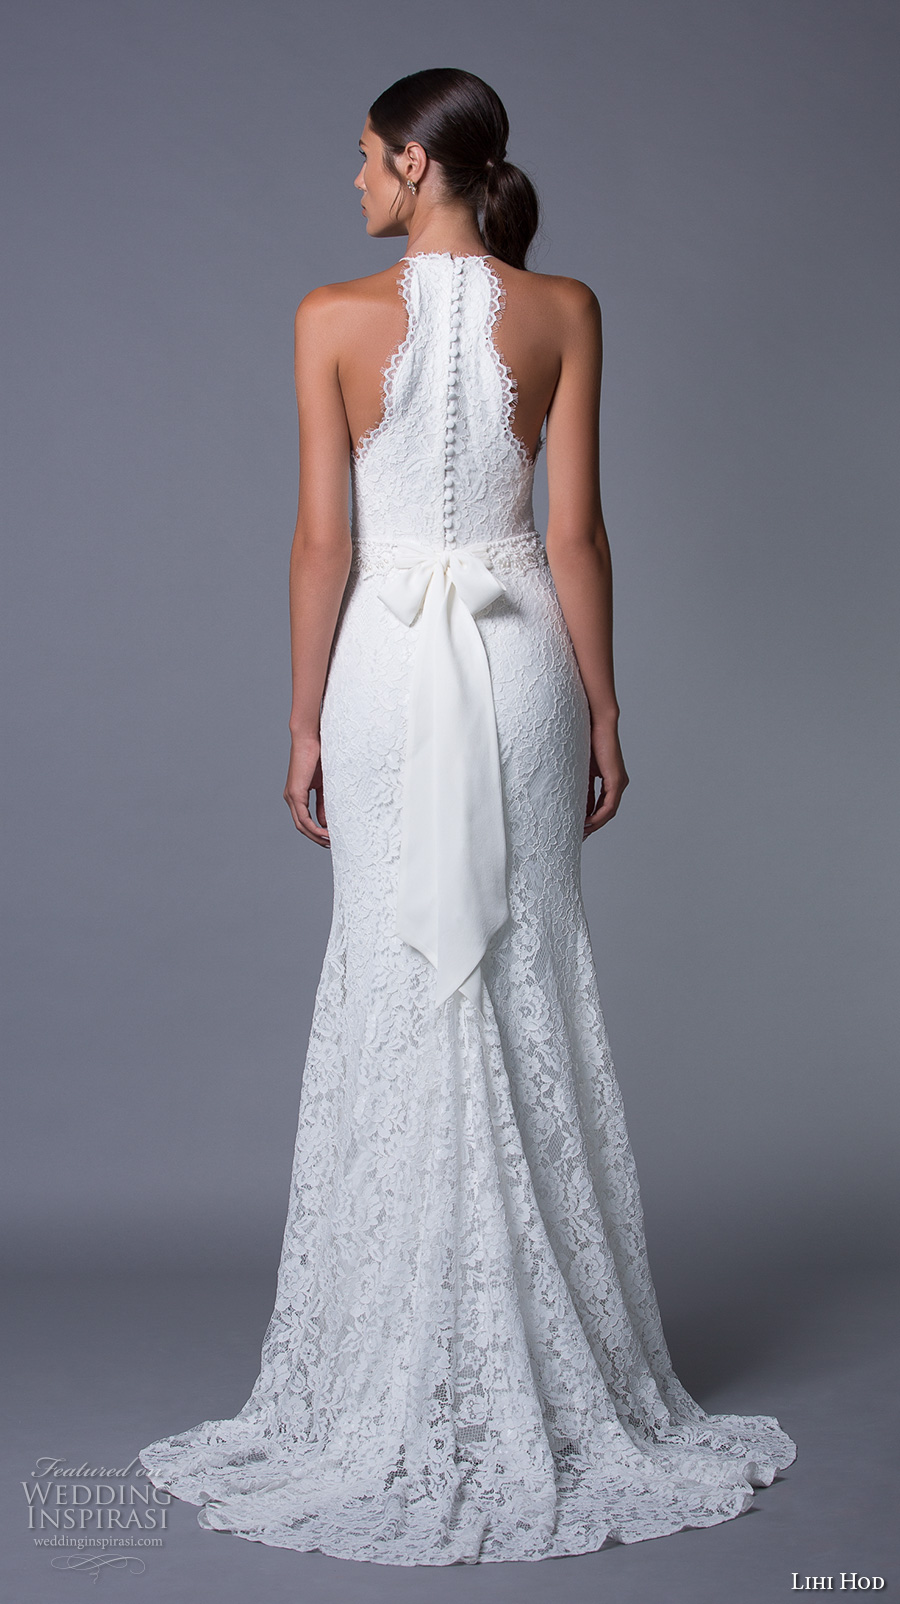 Milanoo Wedding Dresses 89 Fancy lihi hod bridal sleeveless